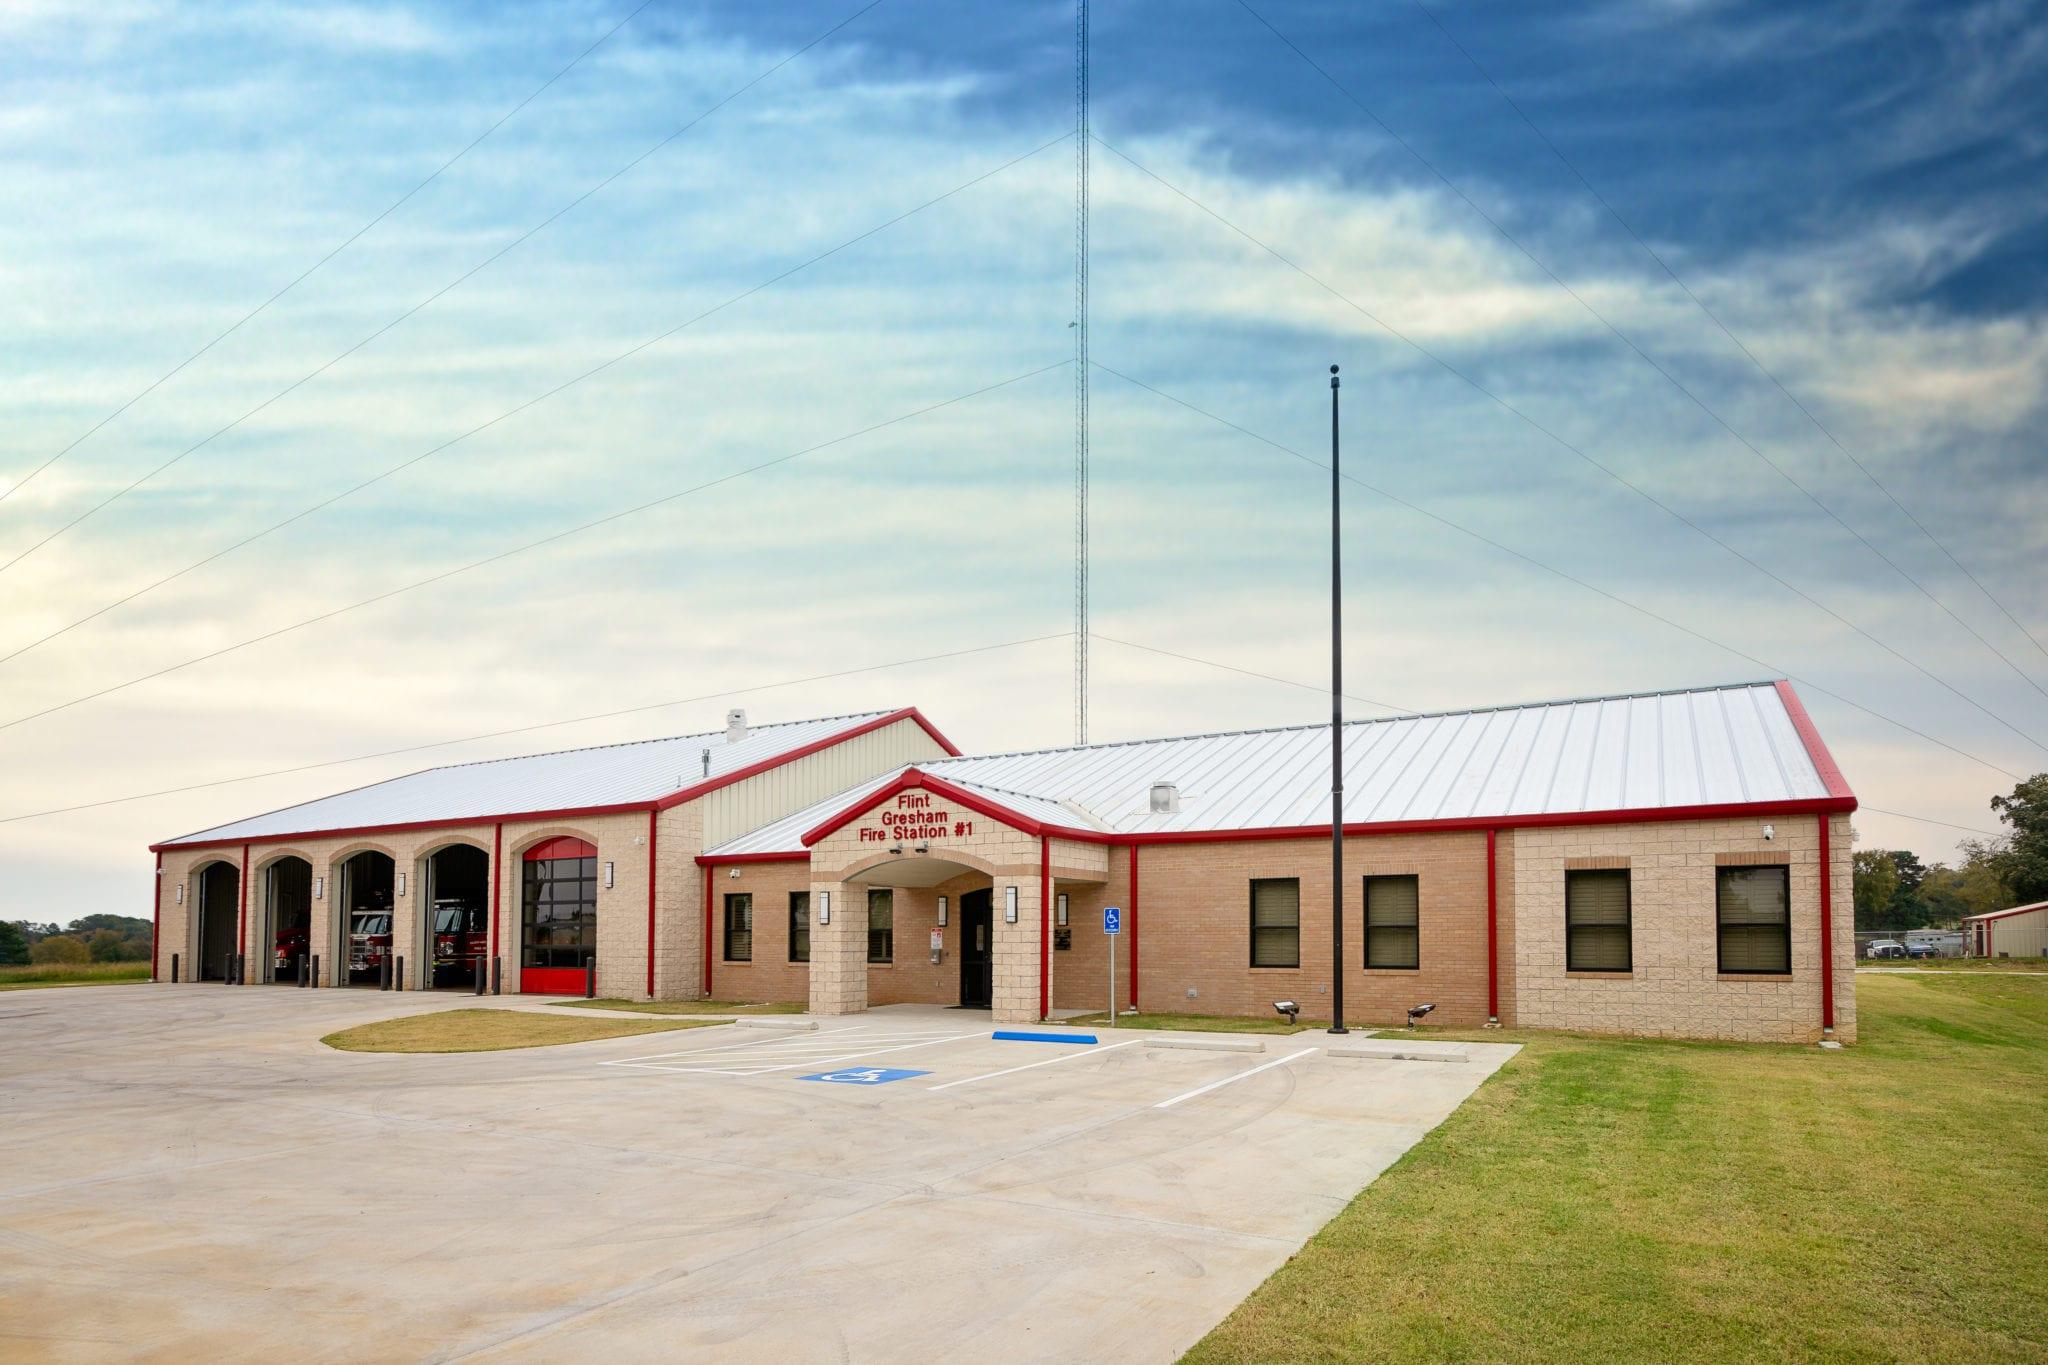 Flint-Gresham Fire Station Metal Building